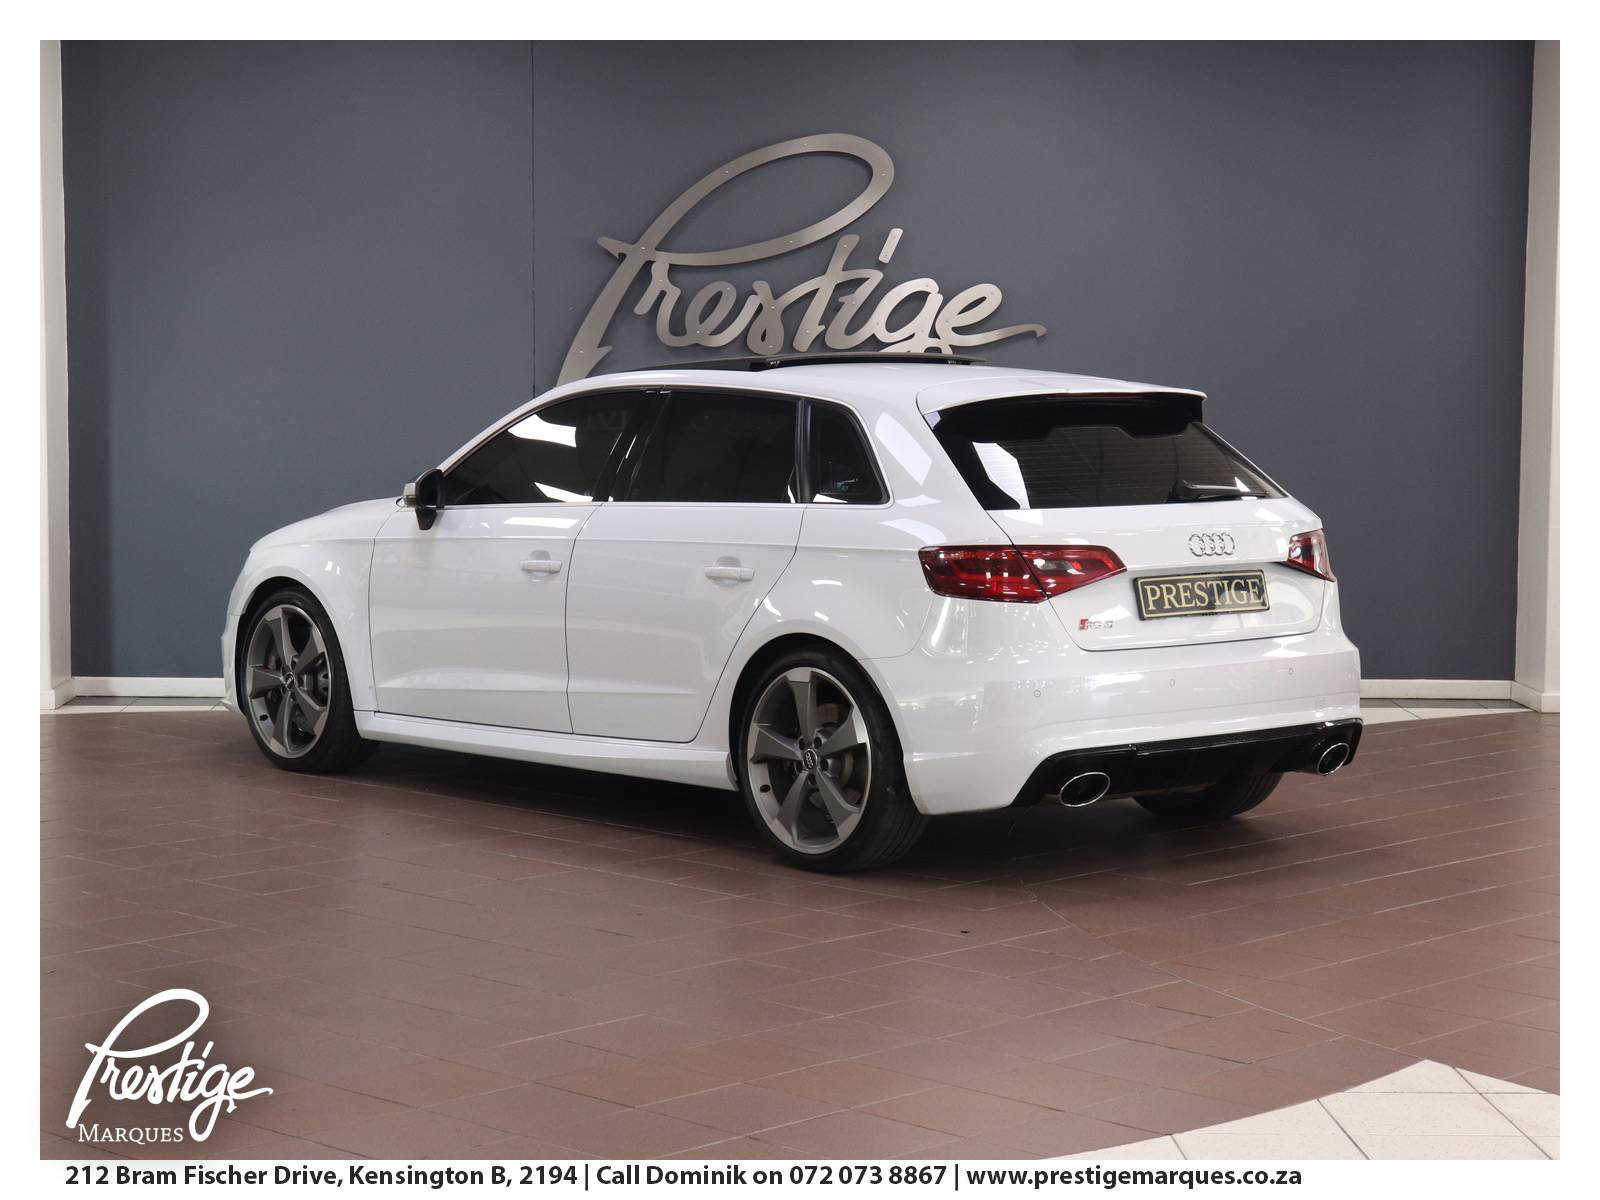 2015-Audi-RS3-Sportback-Prestige-Marques-Randburg-Sandton-4